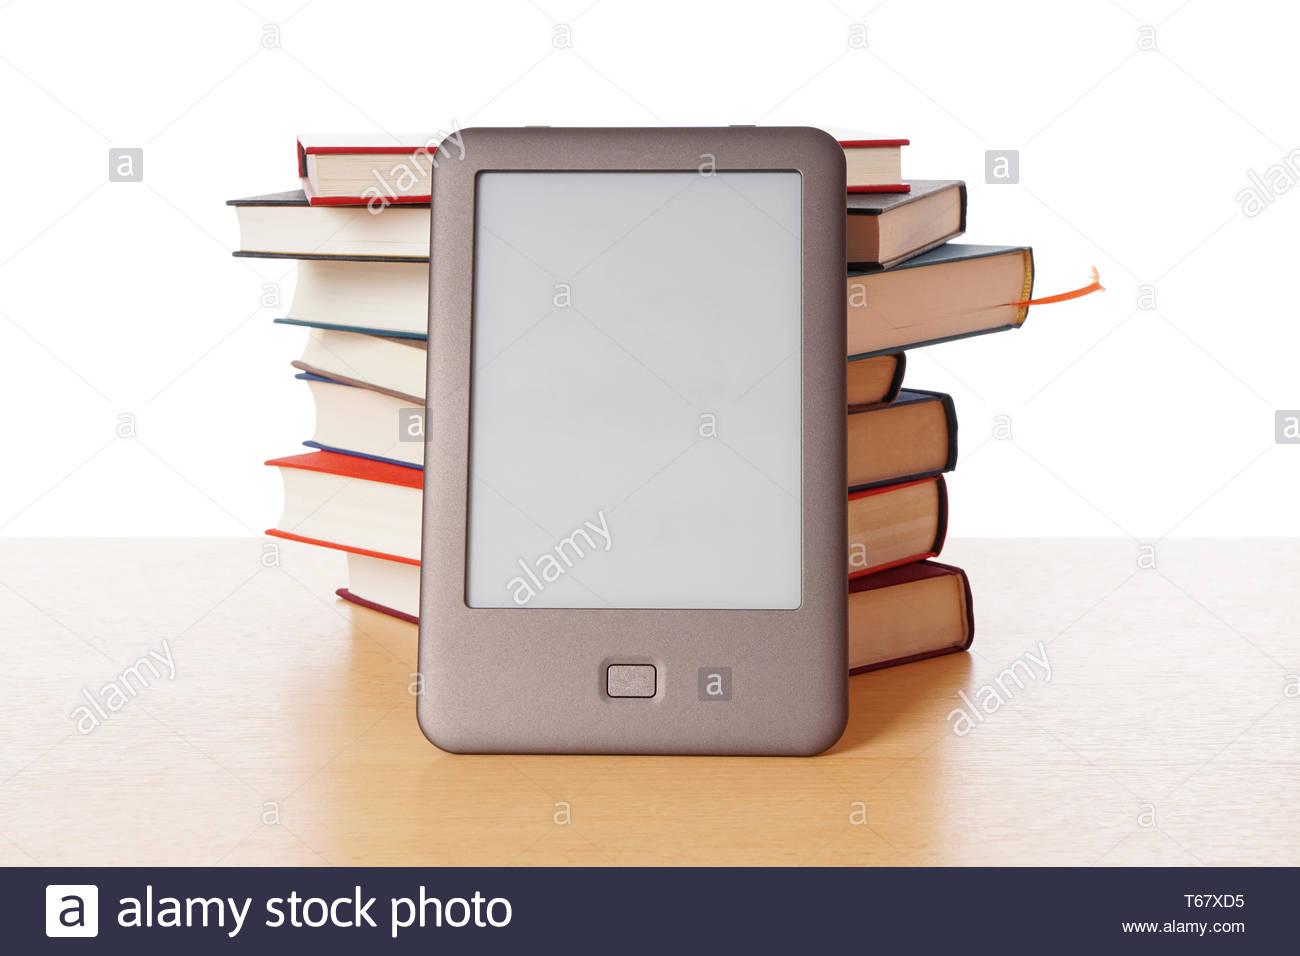 ebook reader vs pile of books - Stock Image